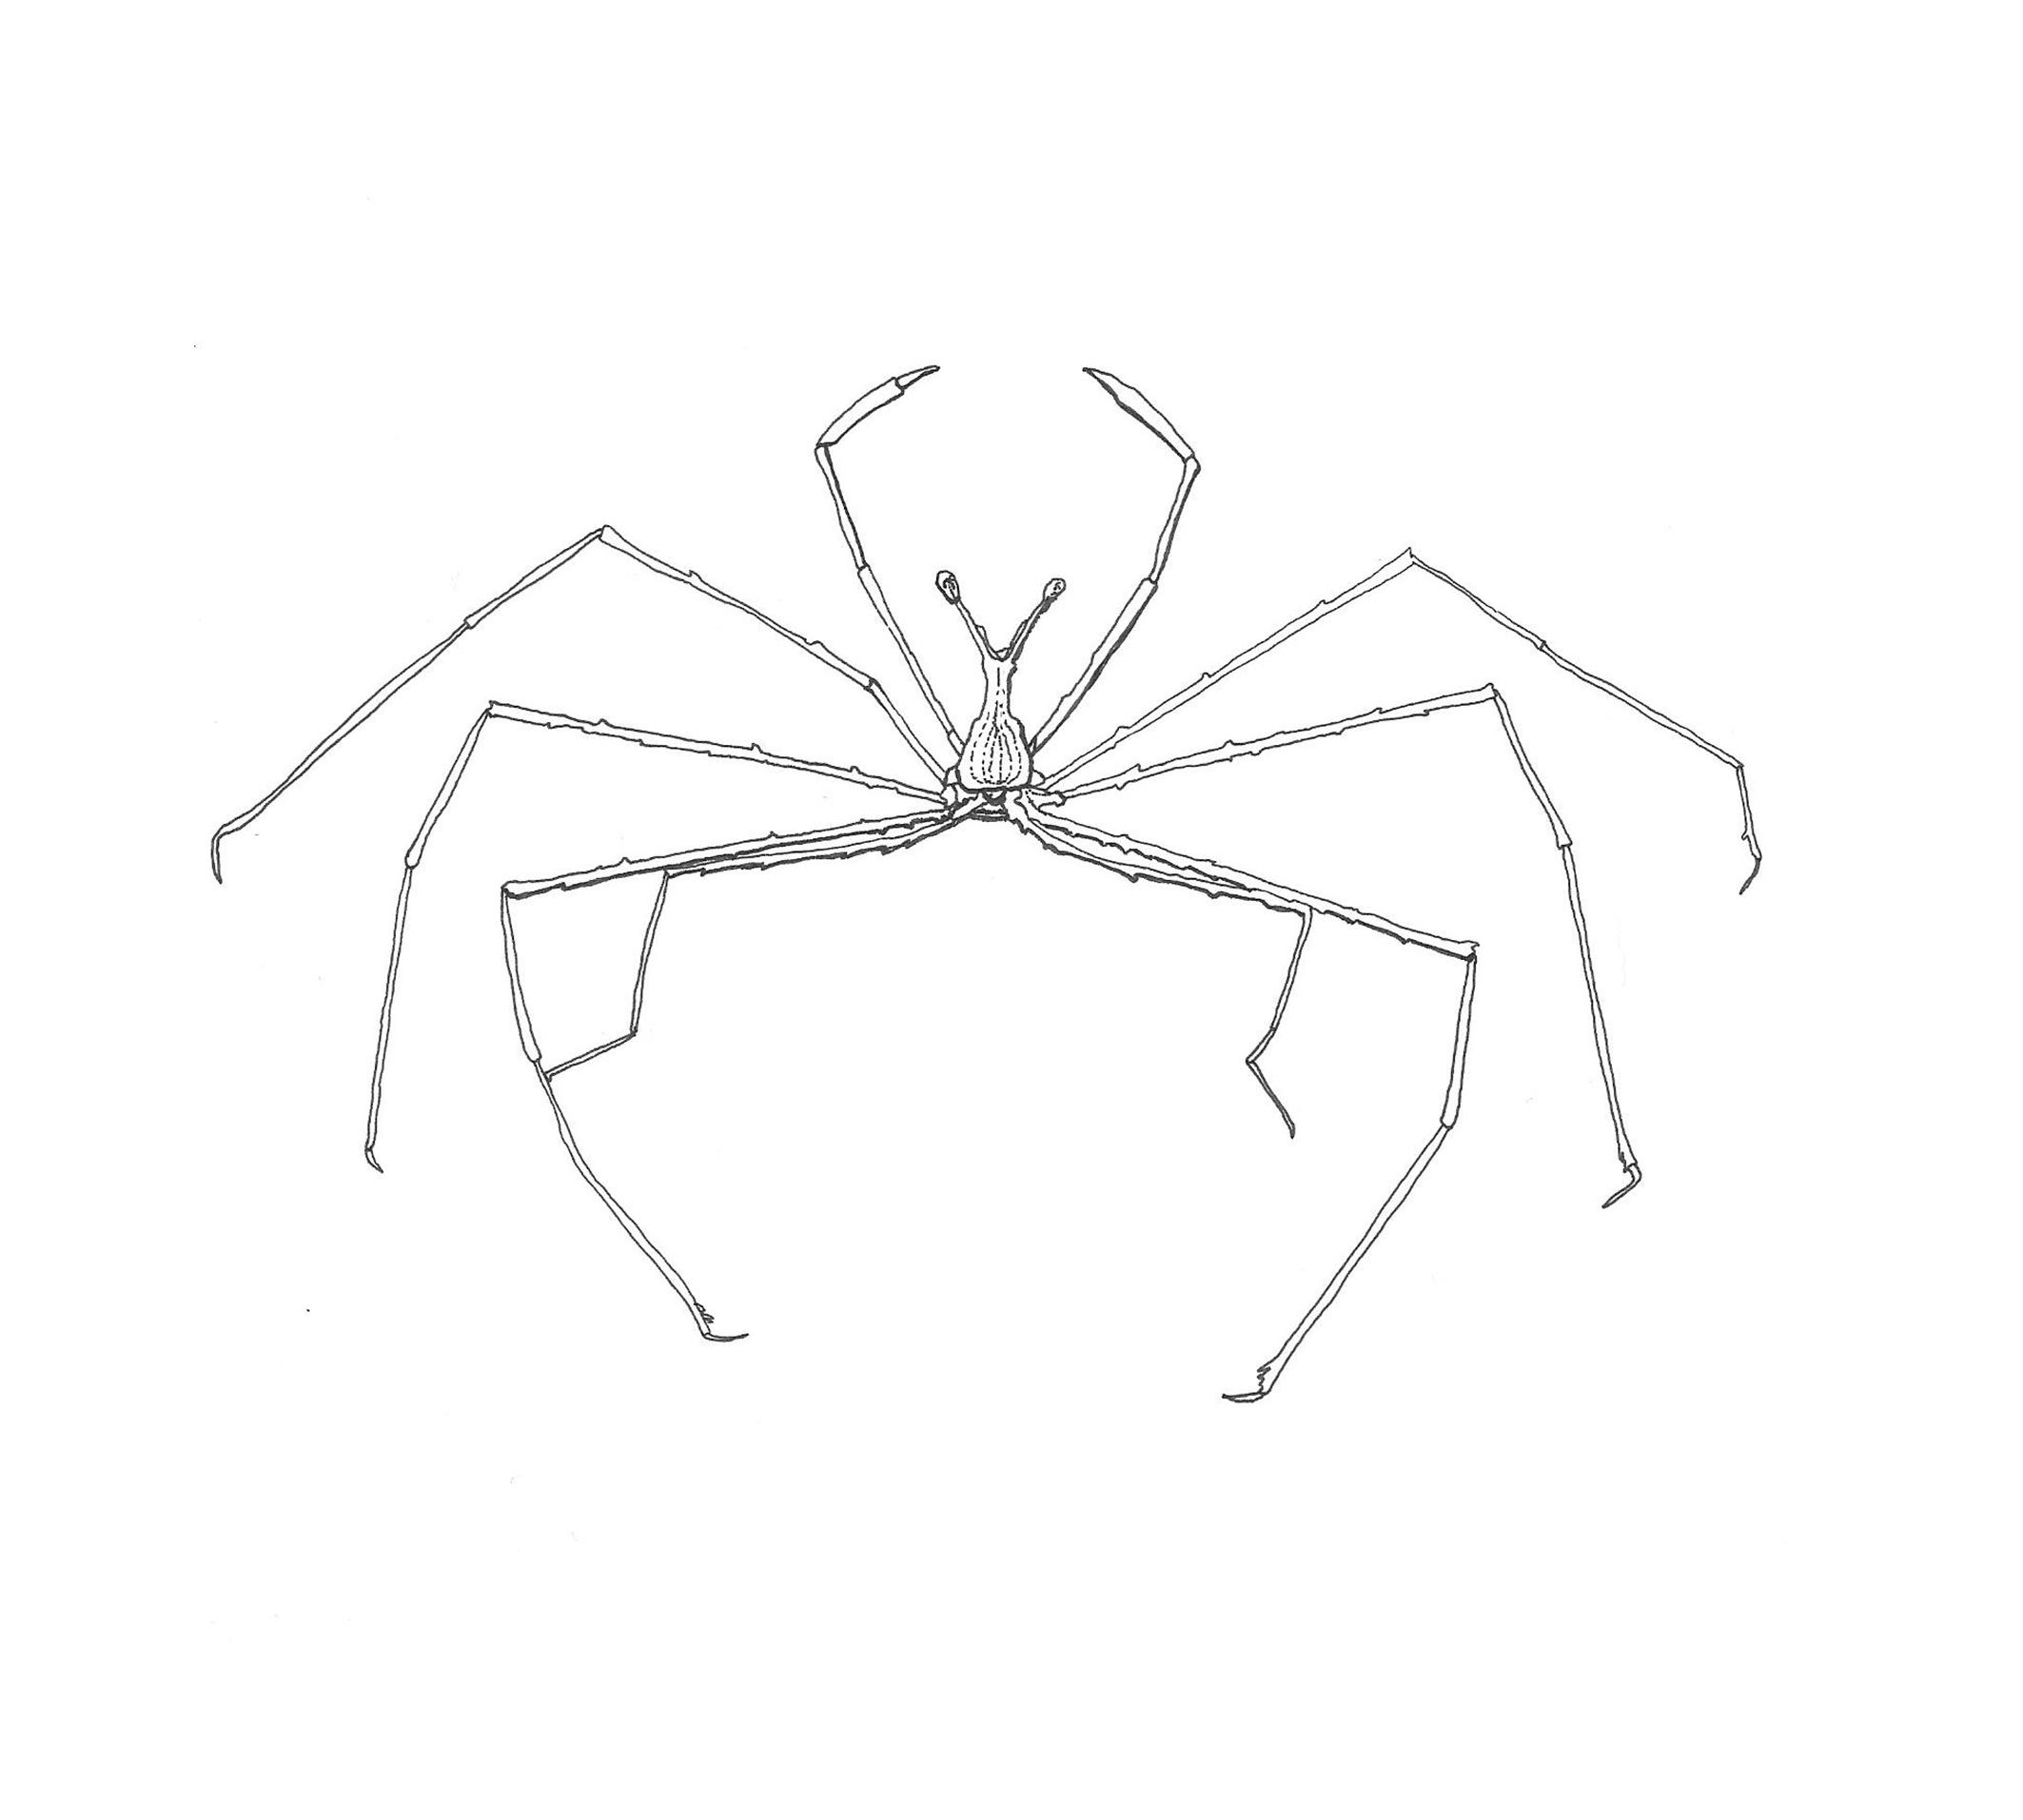 Whiten_crab_illustration_1whiteback.jpg